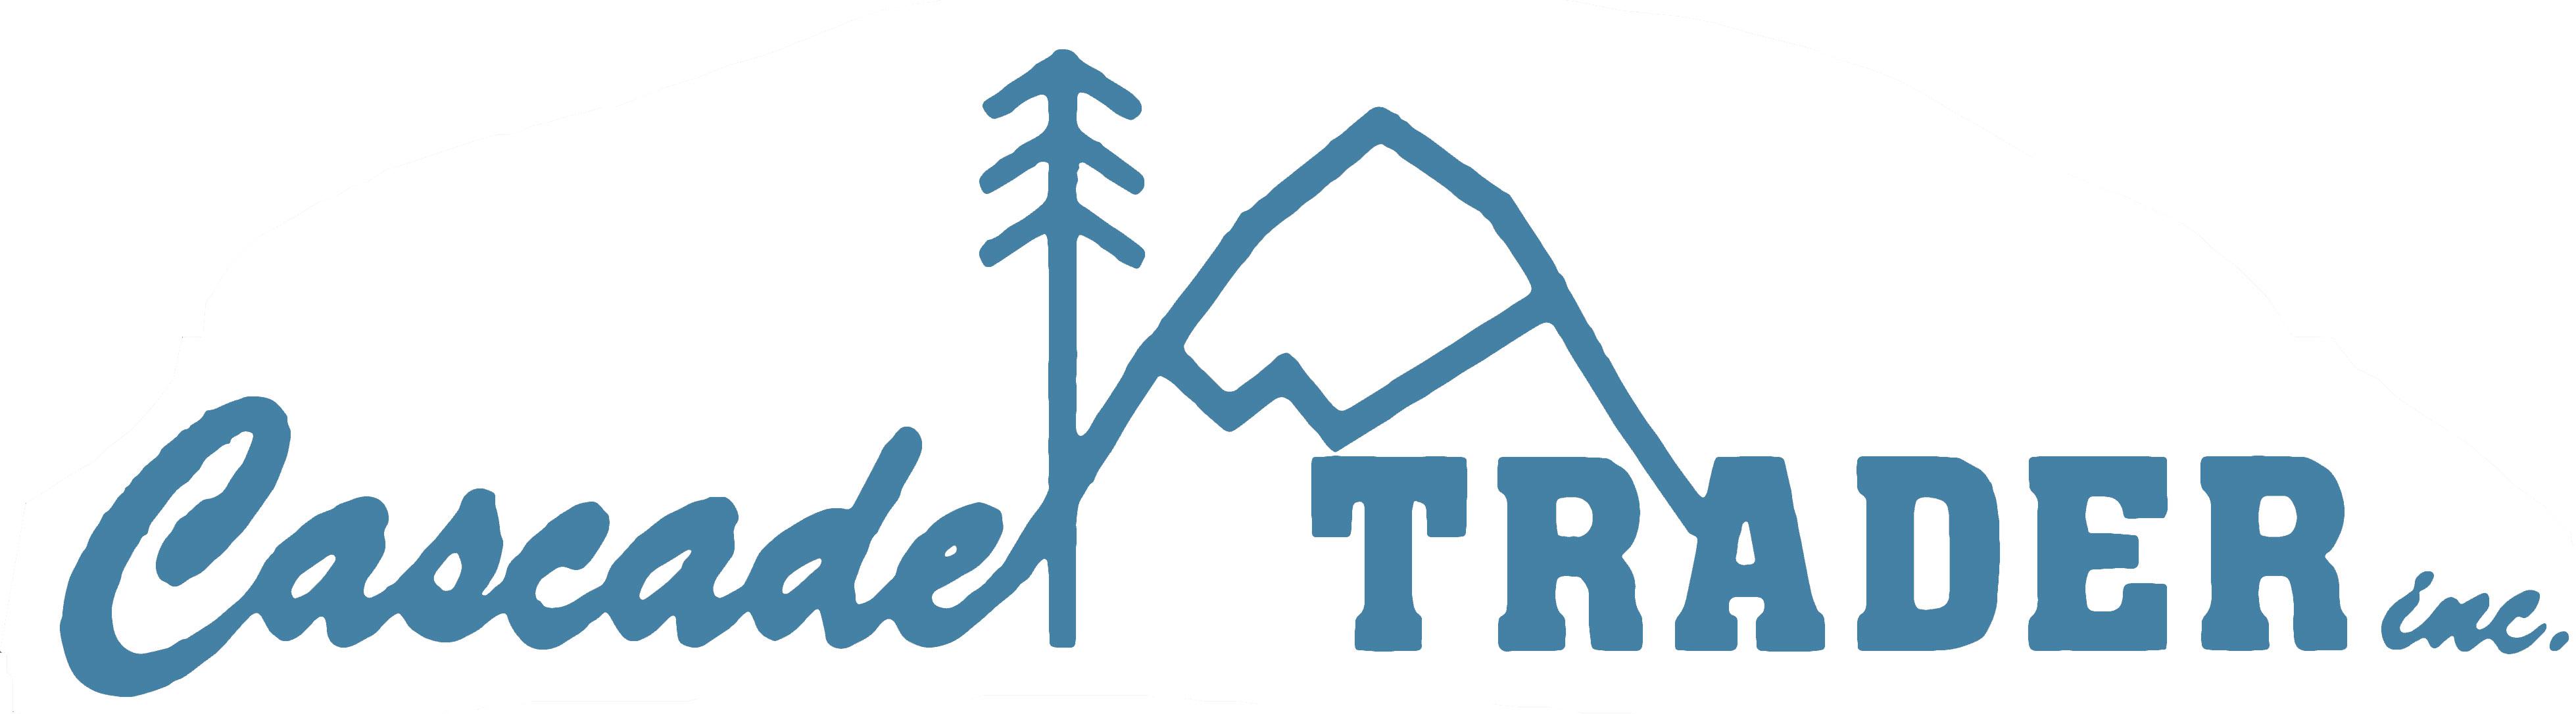 Cascade Trader Inc company logo